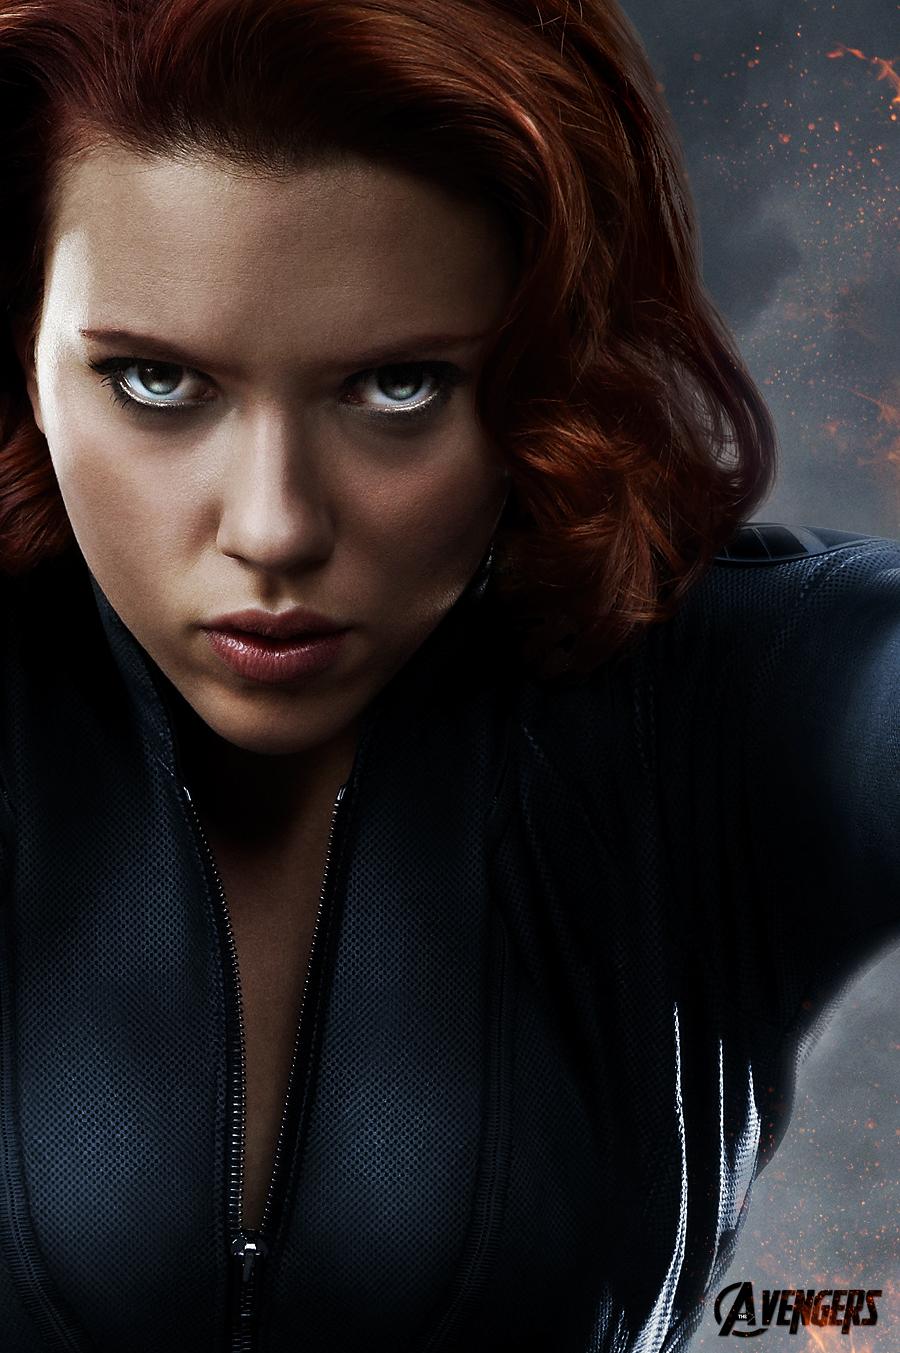 The Avengers- Black Widow 2 by LifeEndsNow on DeviantArt